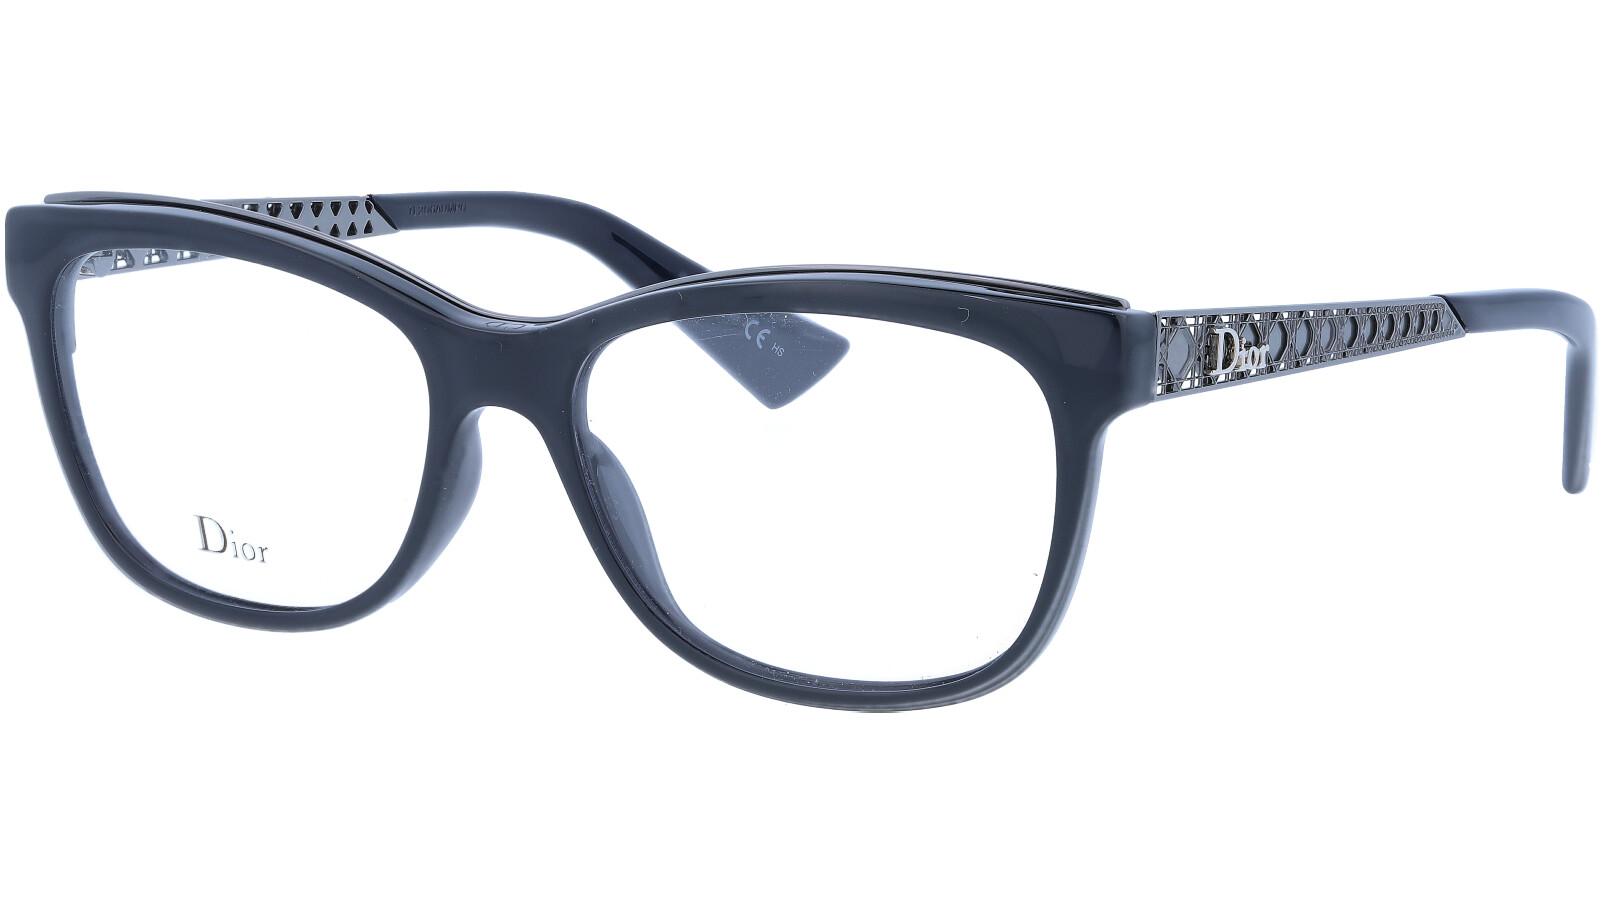 Dior AMAO1 F00 53 Blue Glasses